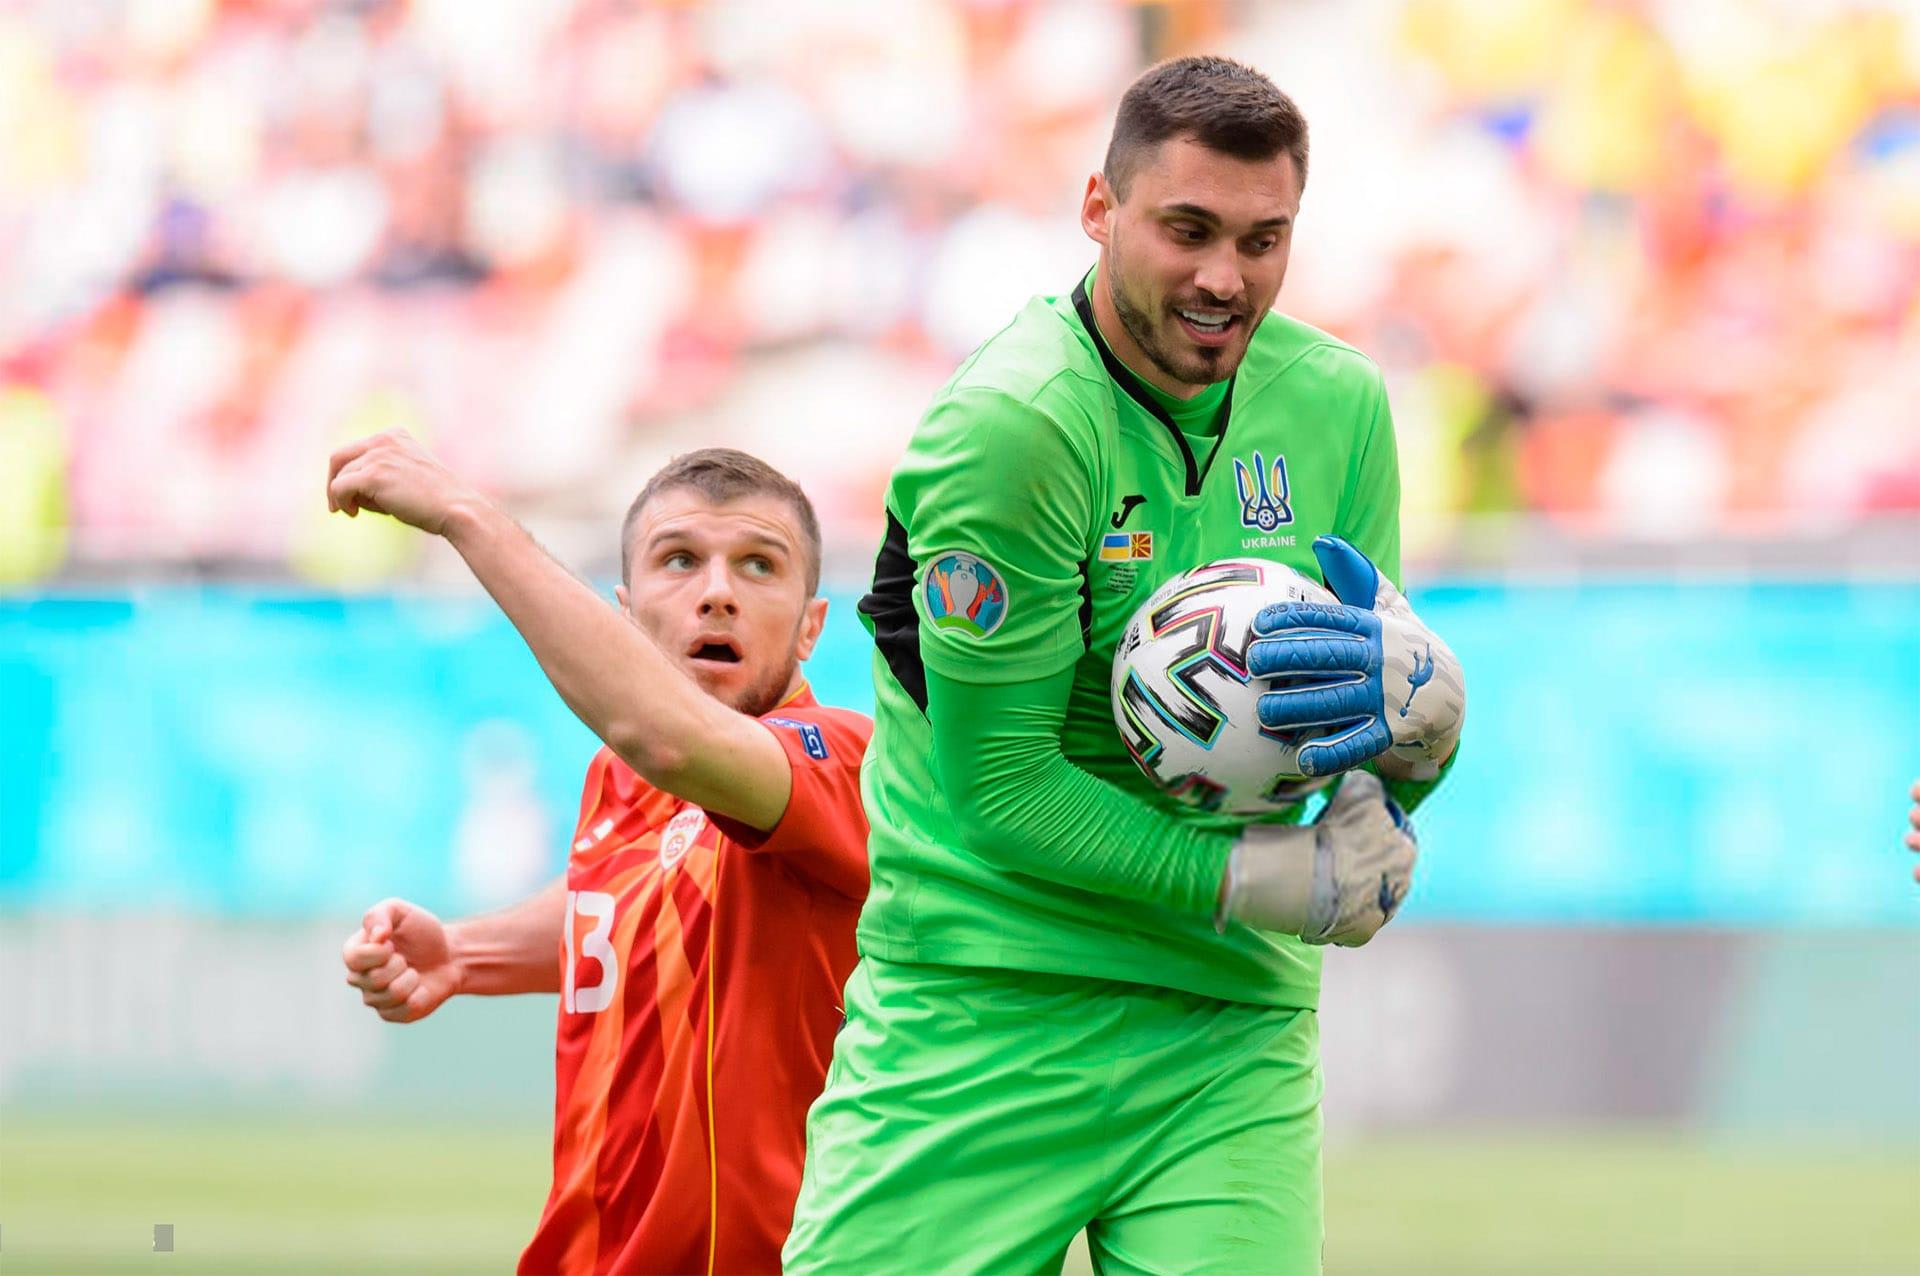 Georgy Bushchan at the European Championship - Brave GK